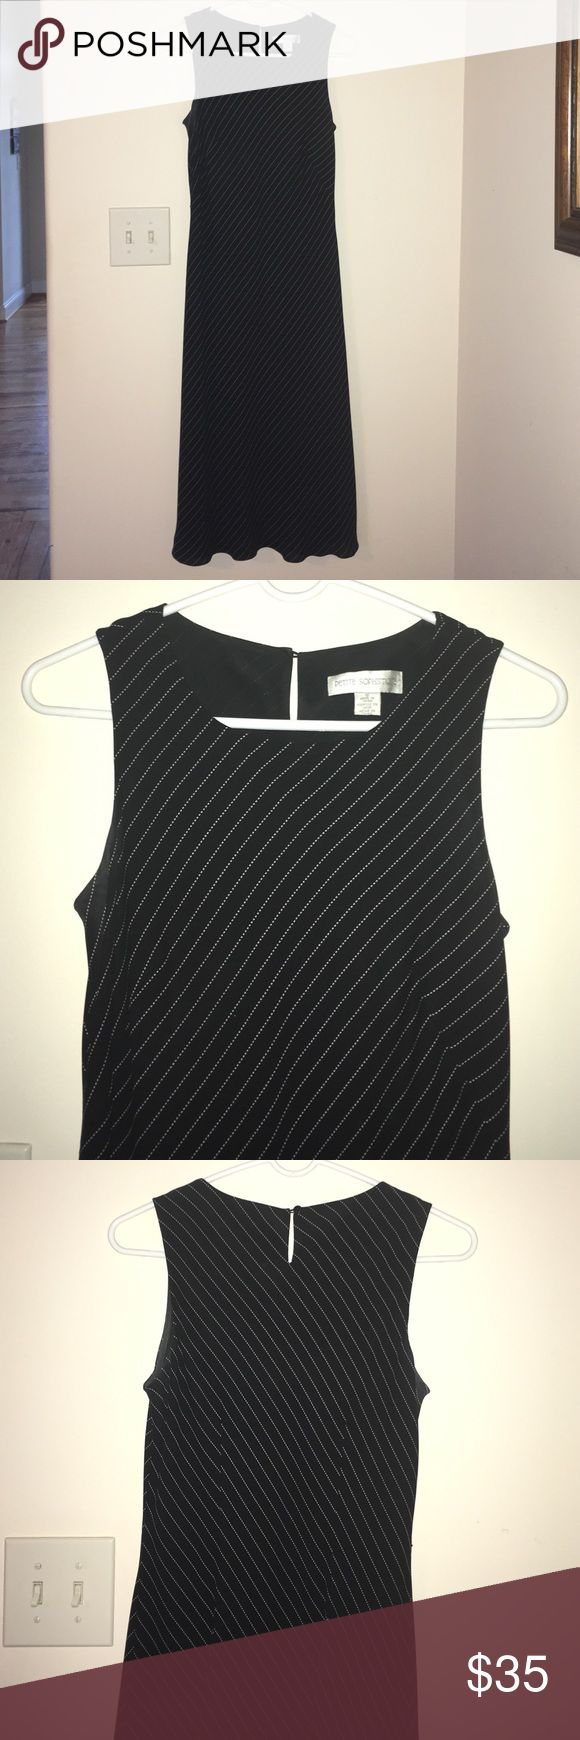 Dress Size 10 black and white striped dress. Petite Sophisticate Dresses